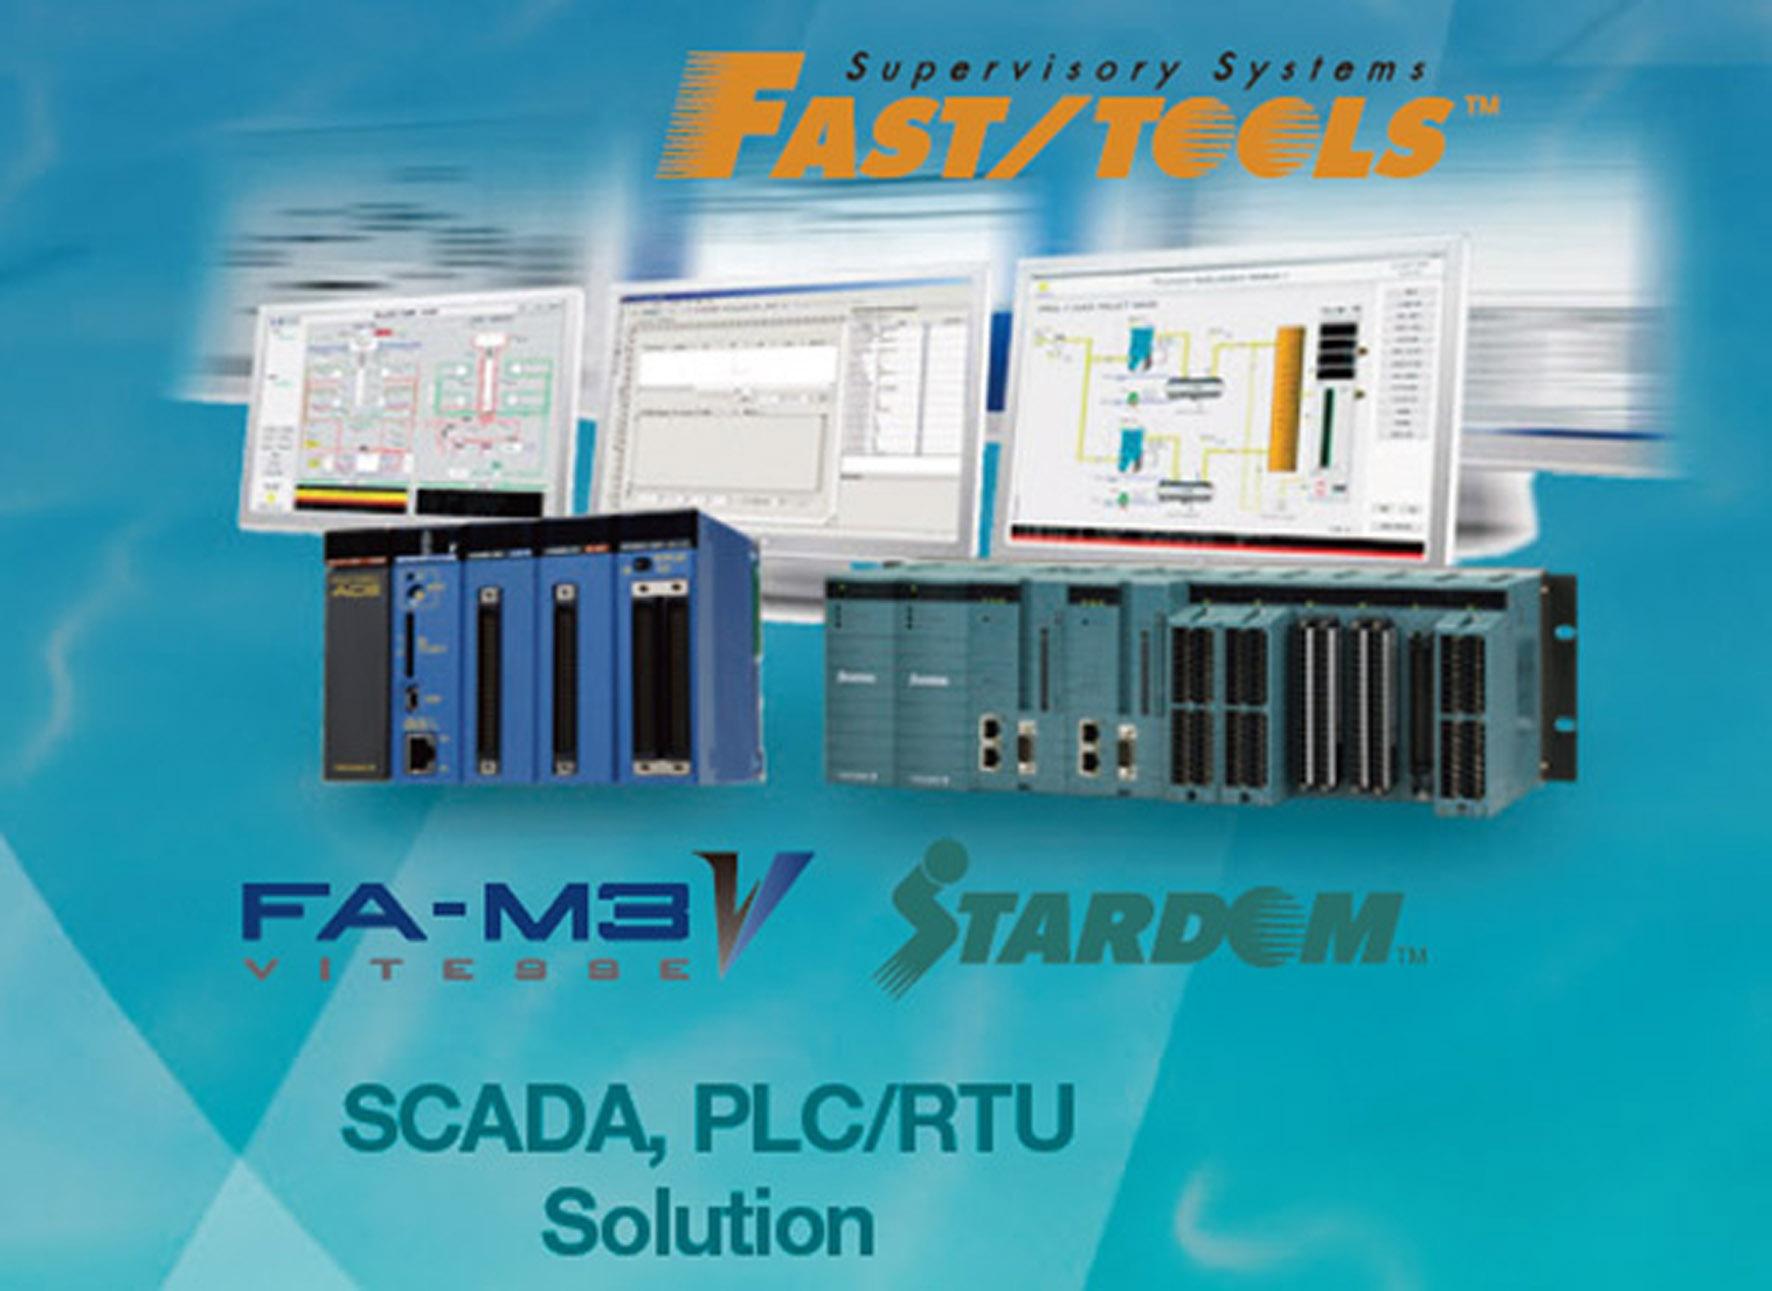 SCADA, PLC/RTU Solution